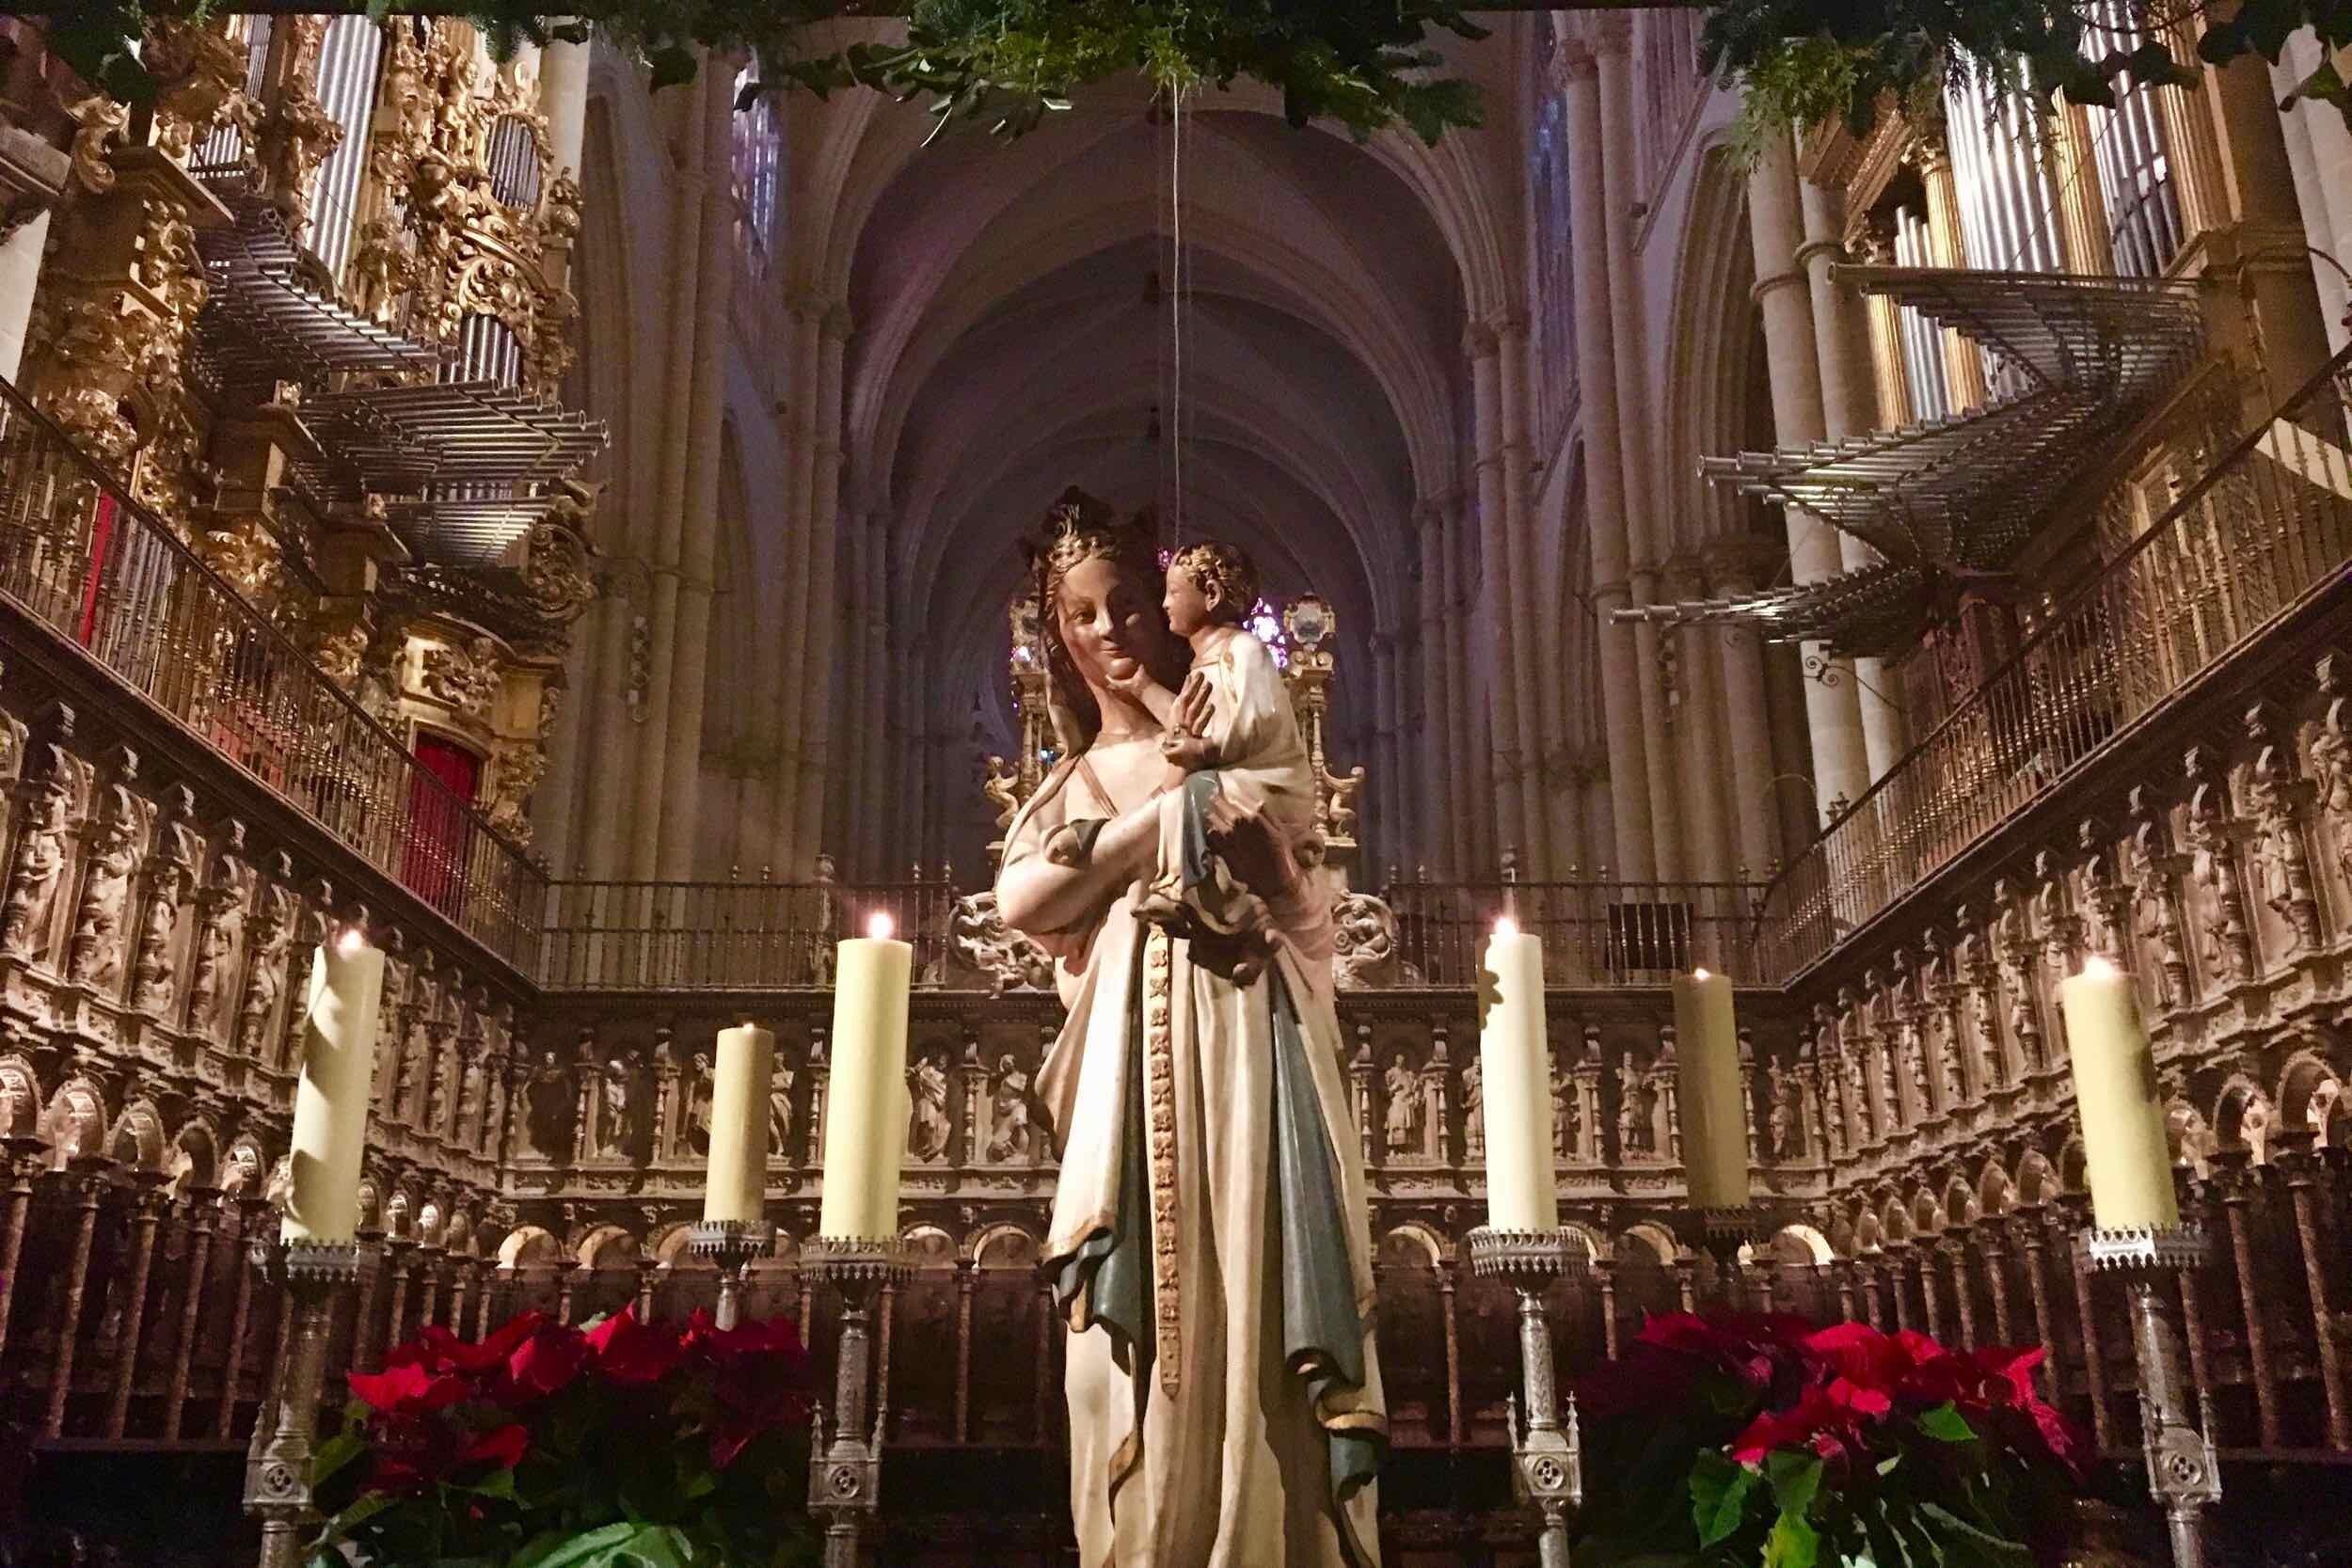 hemels-madrid-toledo-kathedraal-kerst.jpg